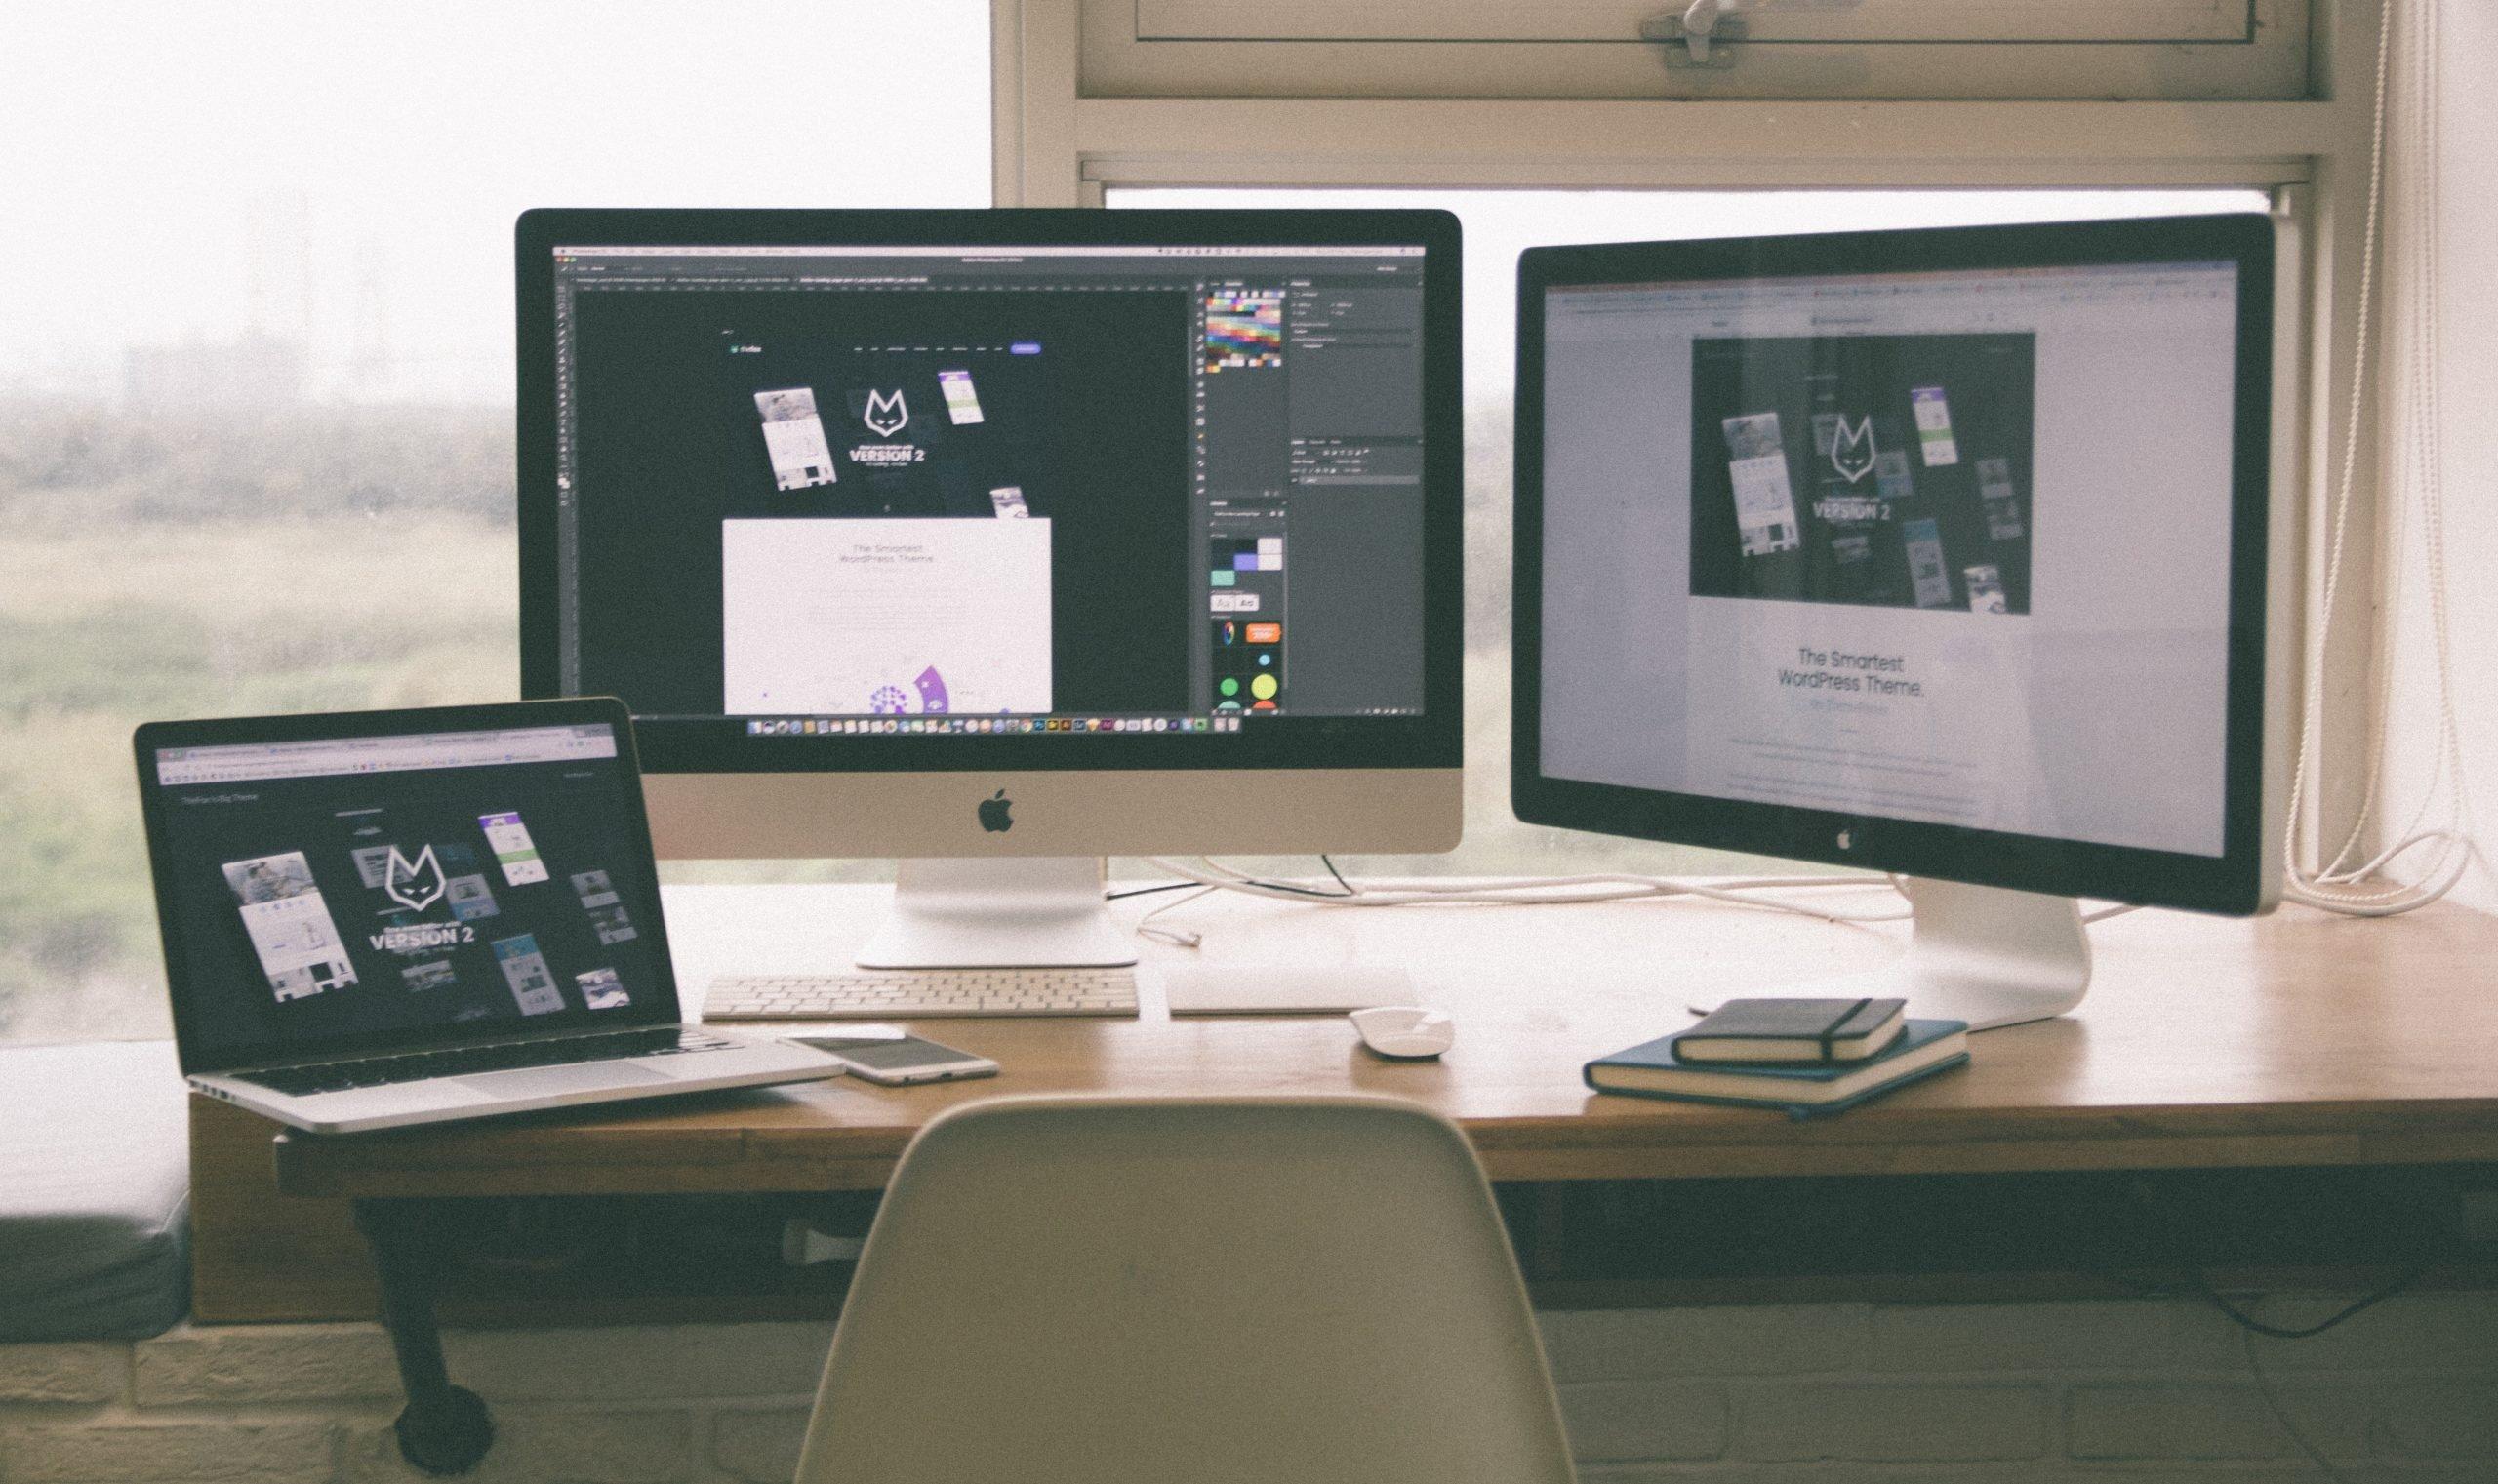 web design on computers